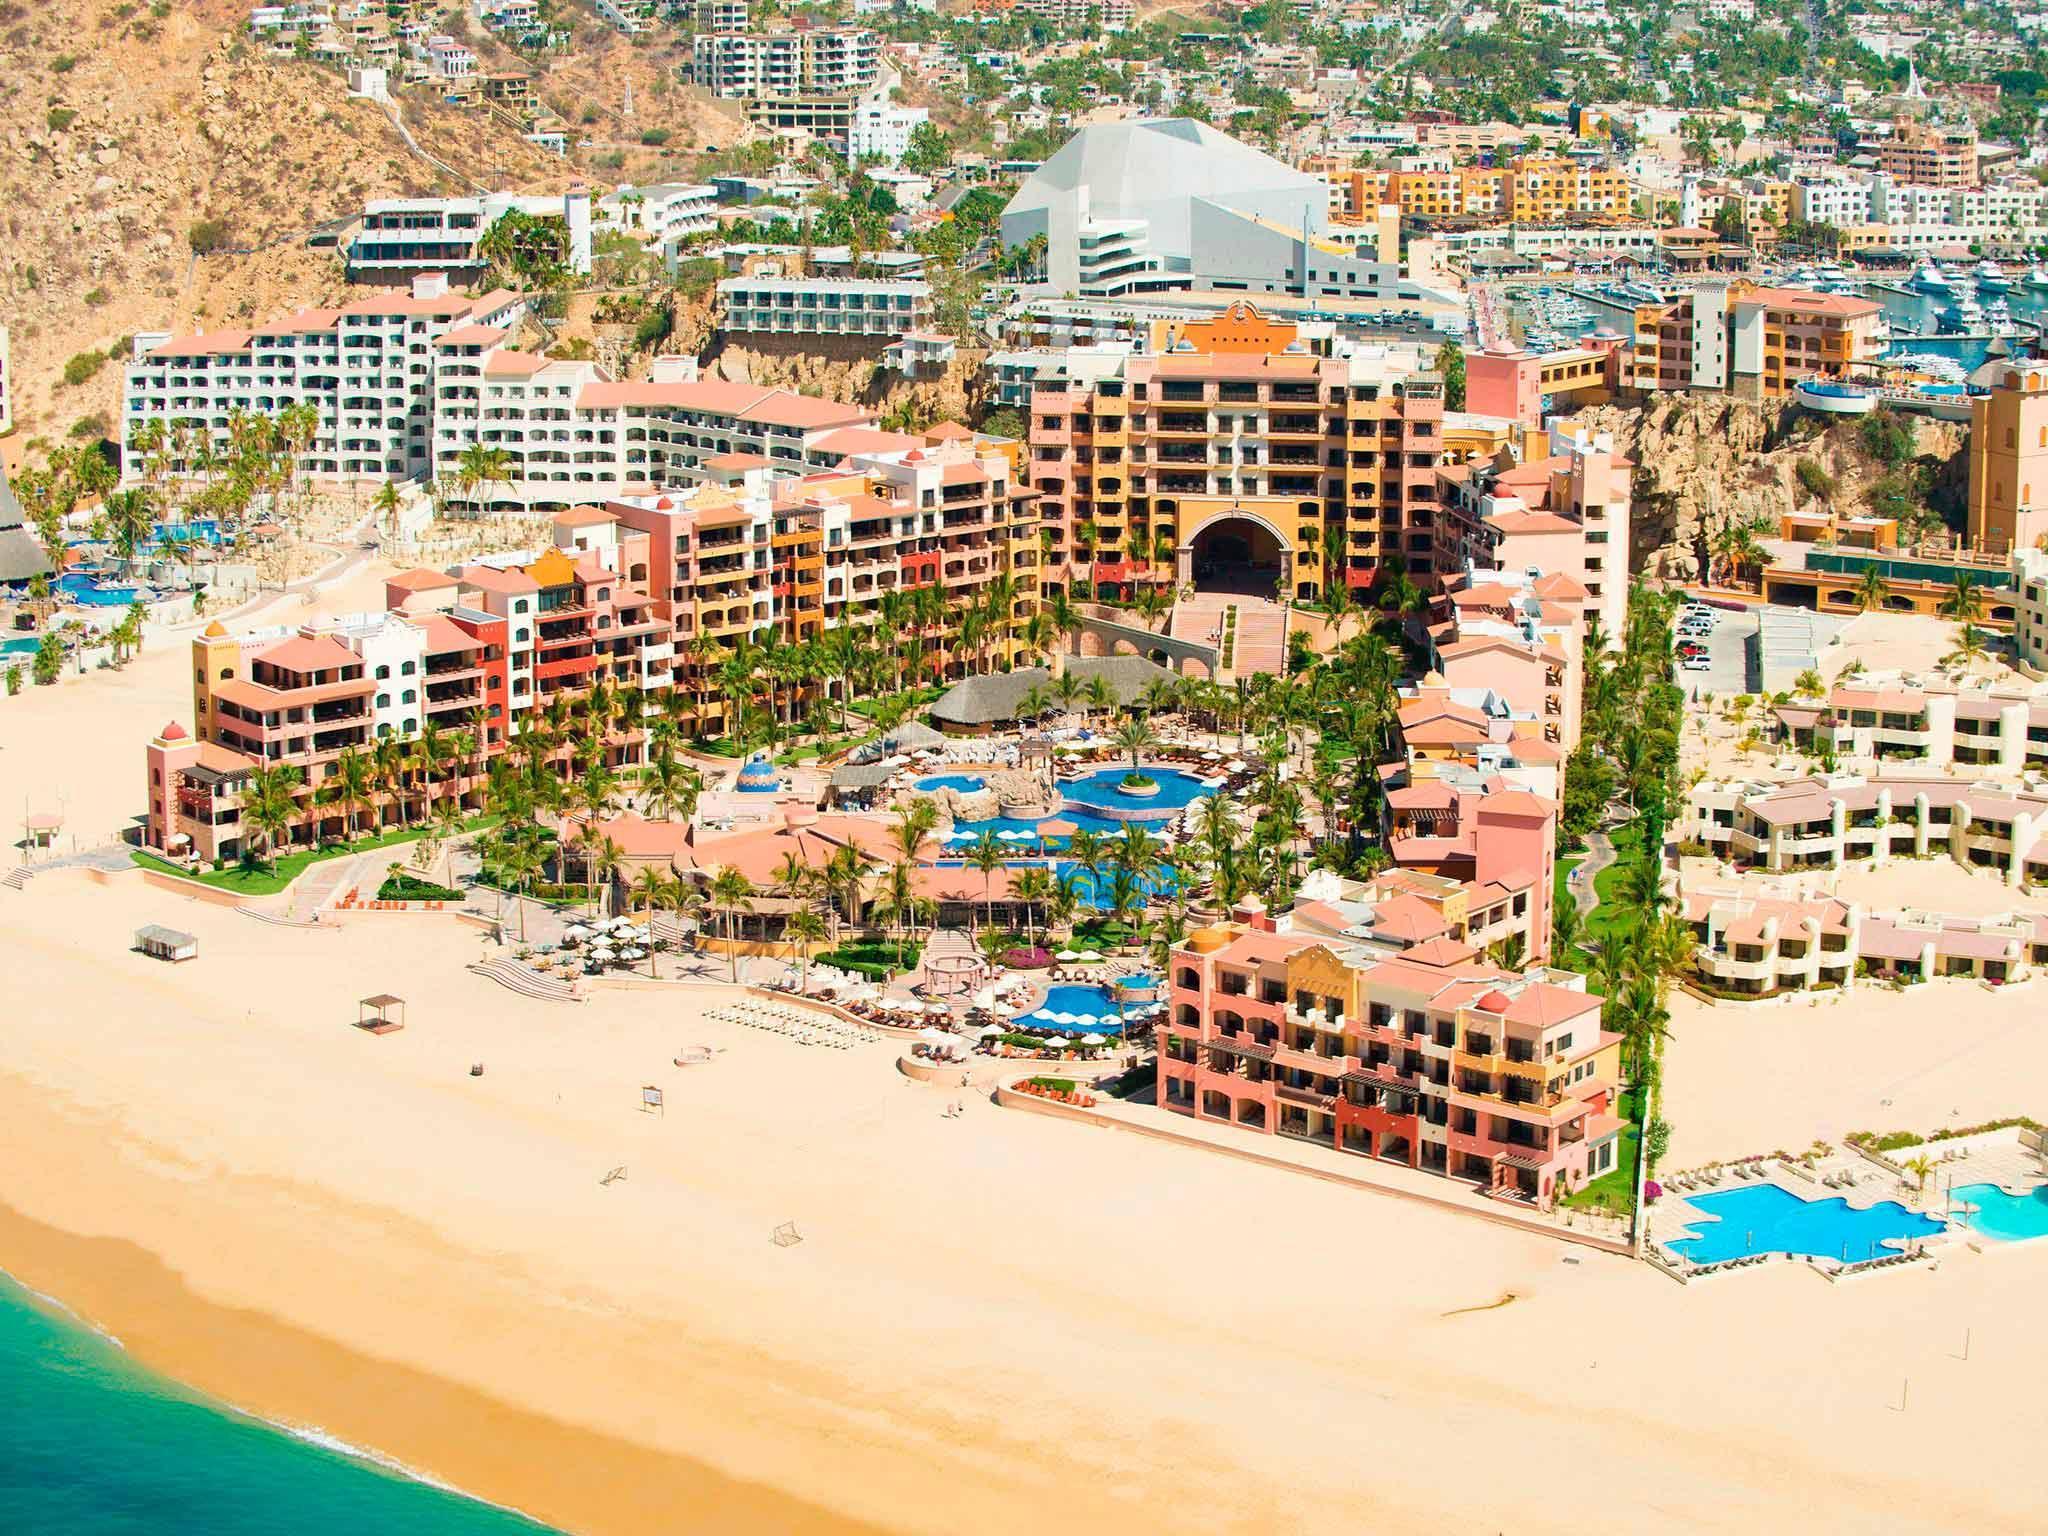 Playa Grande Resort Cabo San Lucas Mexico